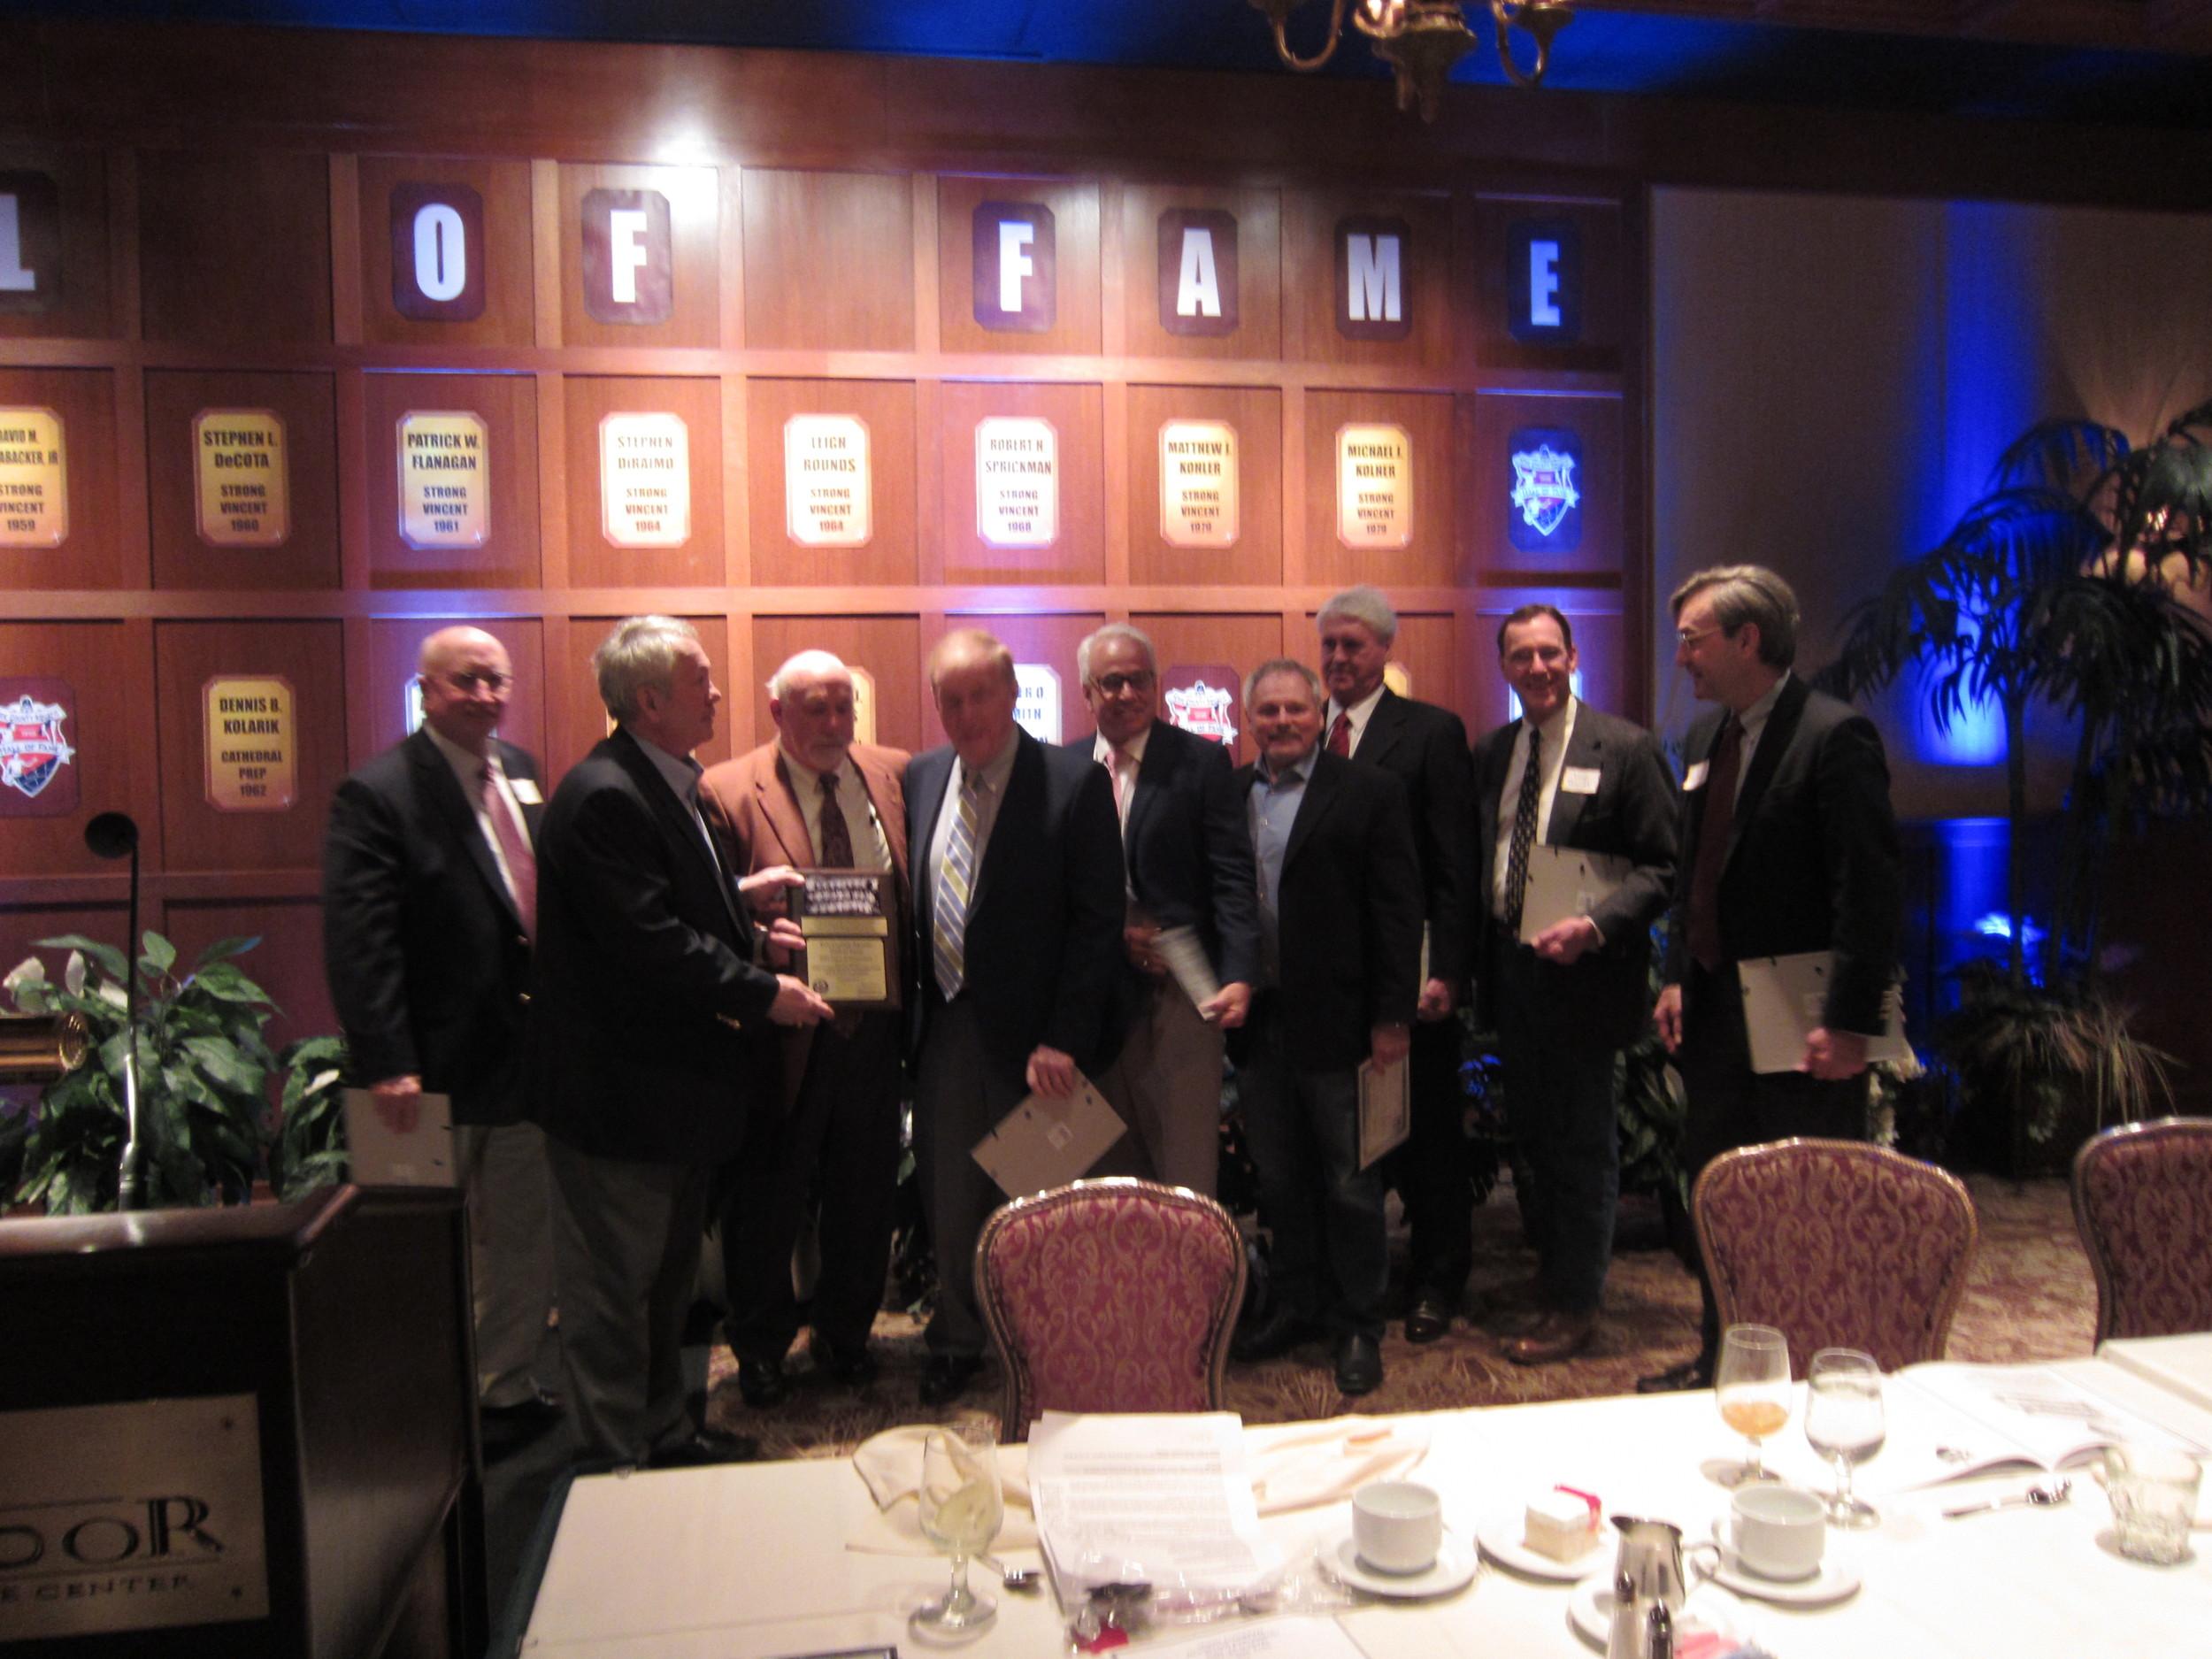 Barry Grossman, County Executive (3rd from left) with members of the 2013 Team of Distinction.   Dave Nelson, Greg Lampe, Grossman, Joe Deimel, Bill Steinbrink, Steve DiRaimo, Les Moore, Leigh Rounds, Bill Lillis